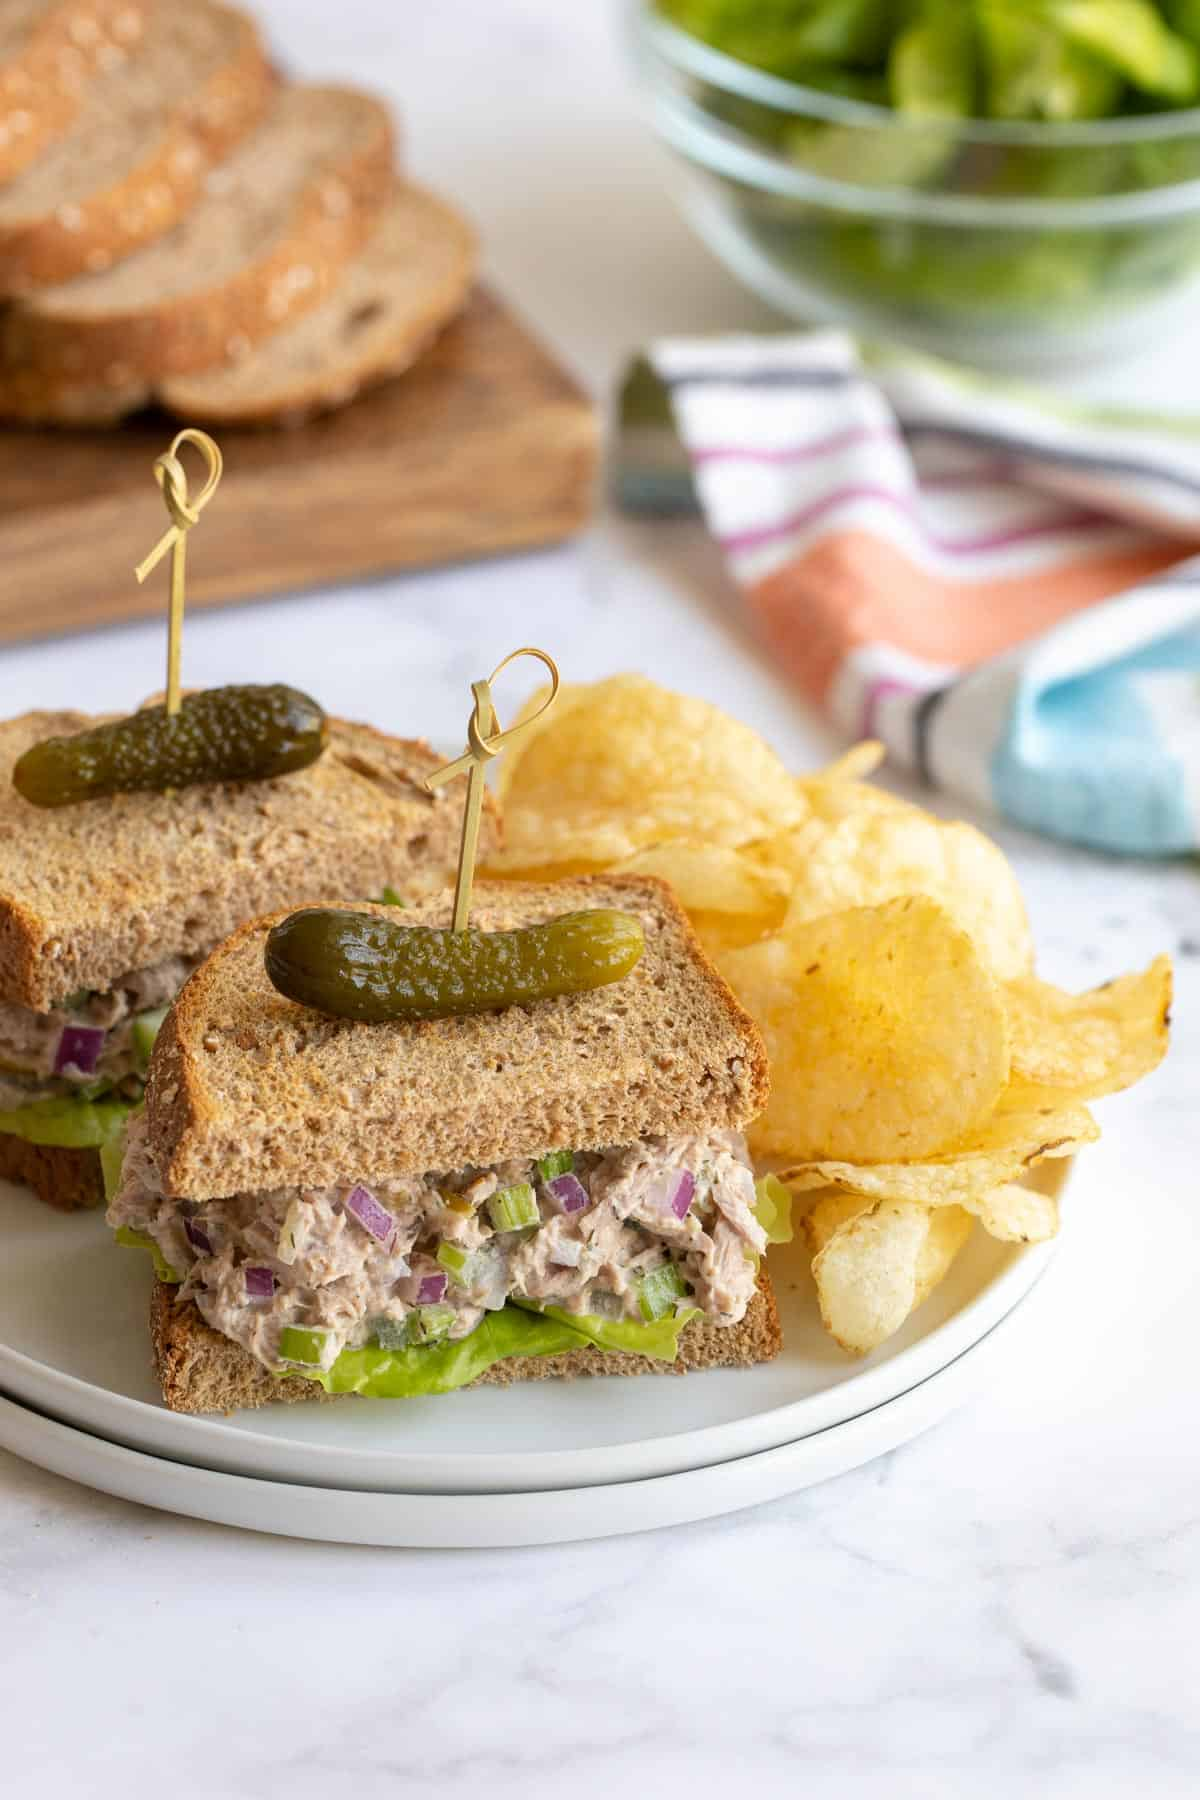 A sliced tuna salad sandwich on a white plate with potato chips.